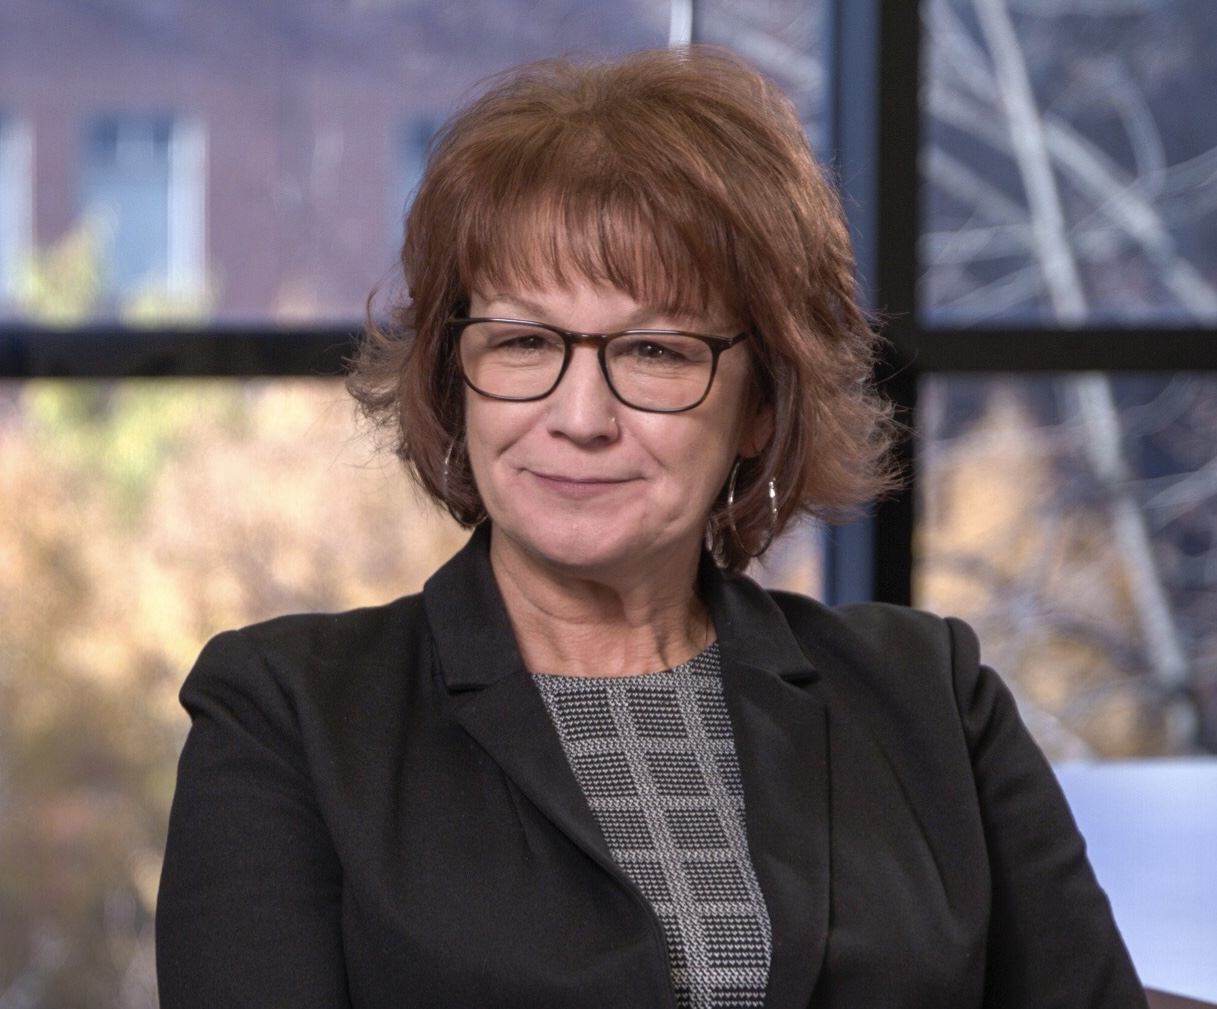 Sandra Cramolini